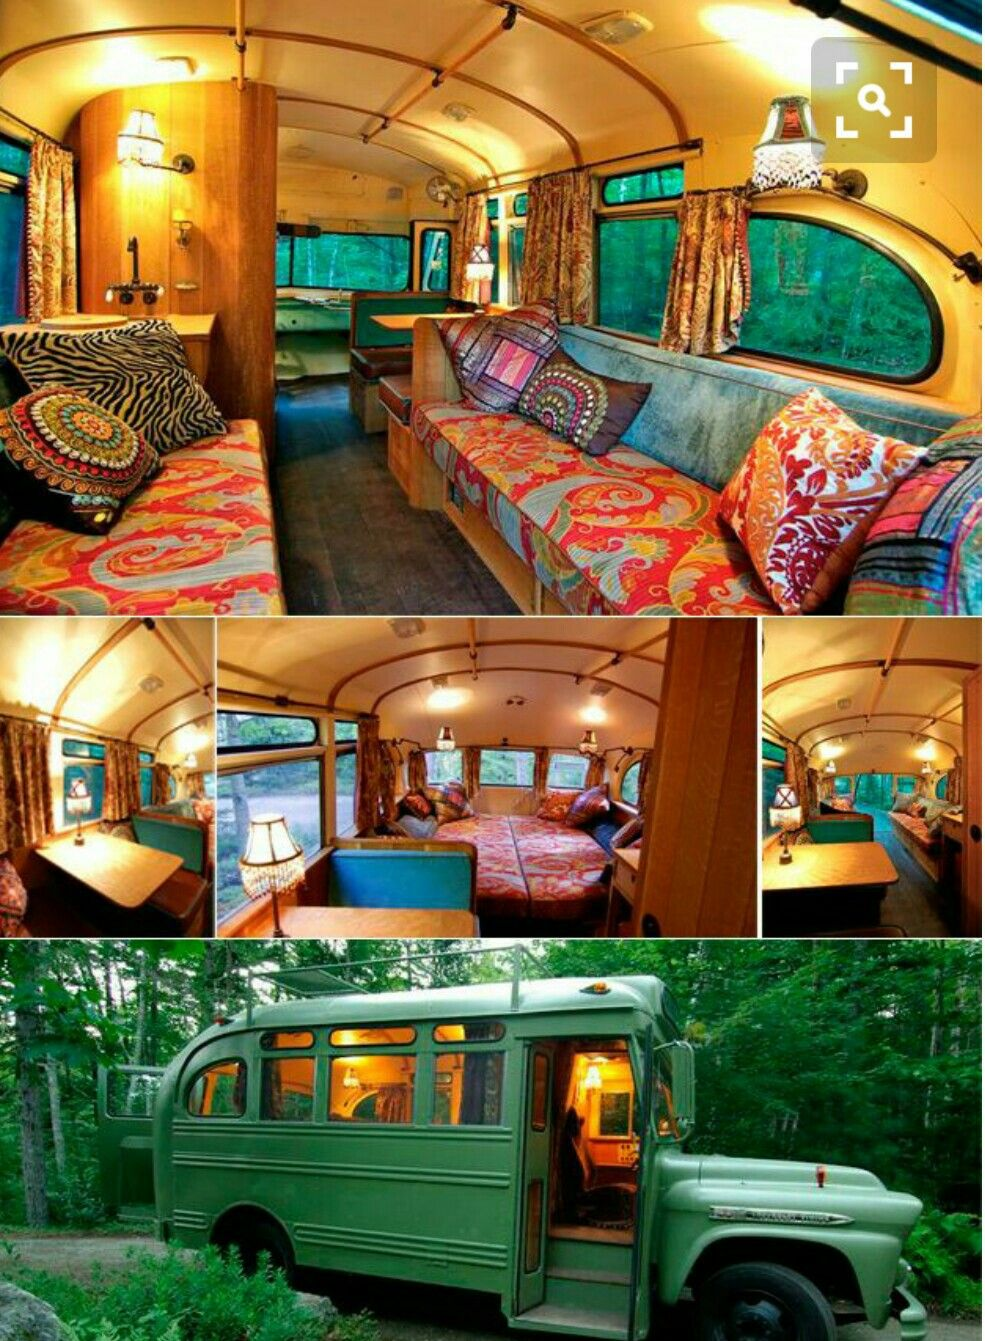 Bus Camper Image By Zeynep On Never Stop